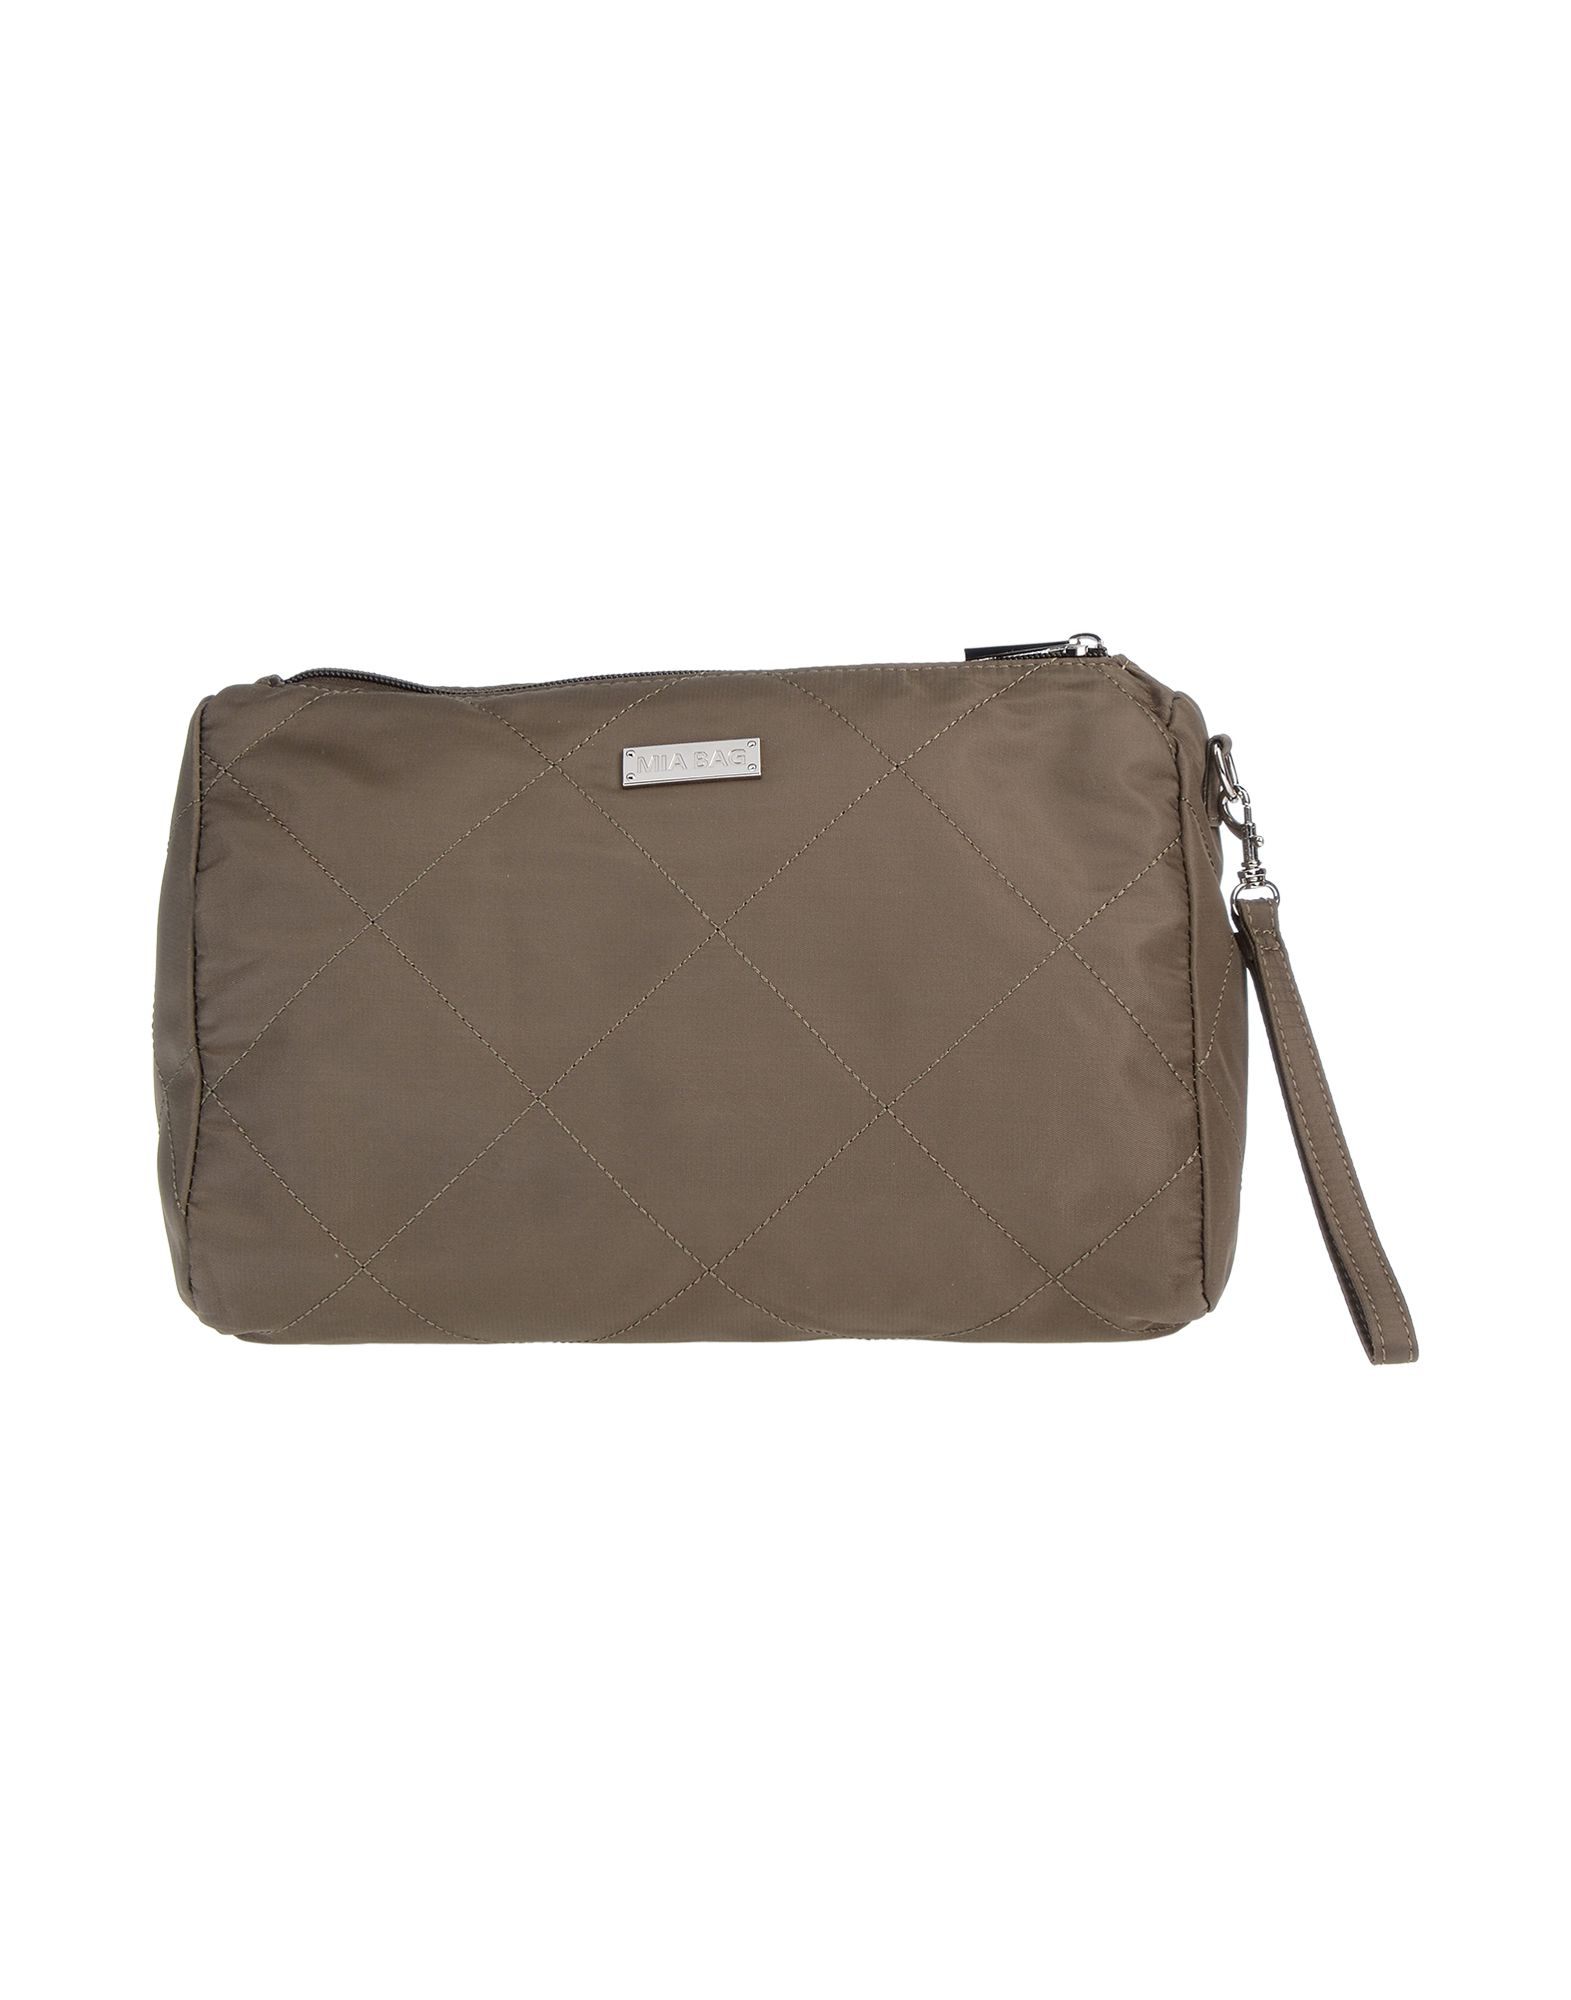 Фото - MIA BAG Beauty case cow leather tote bag brand 2018 bolsa feminina new women handbag 100% genuine leather alligator shoulder bag free shipping